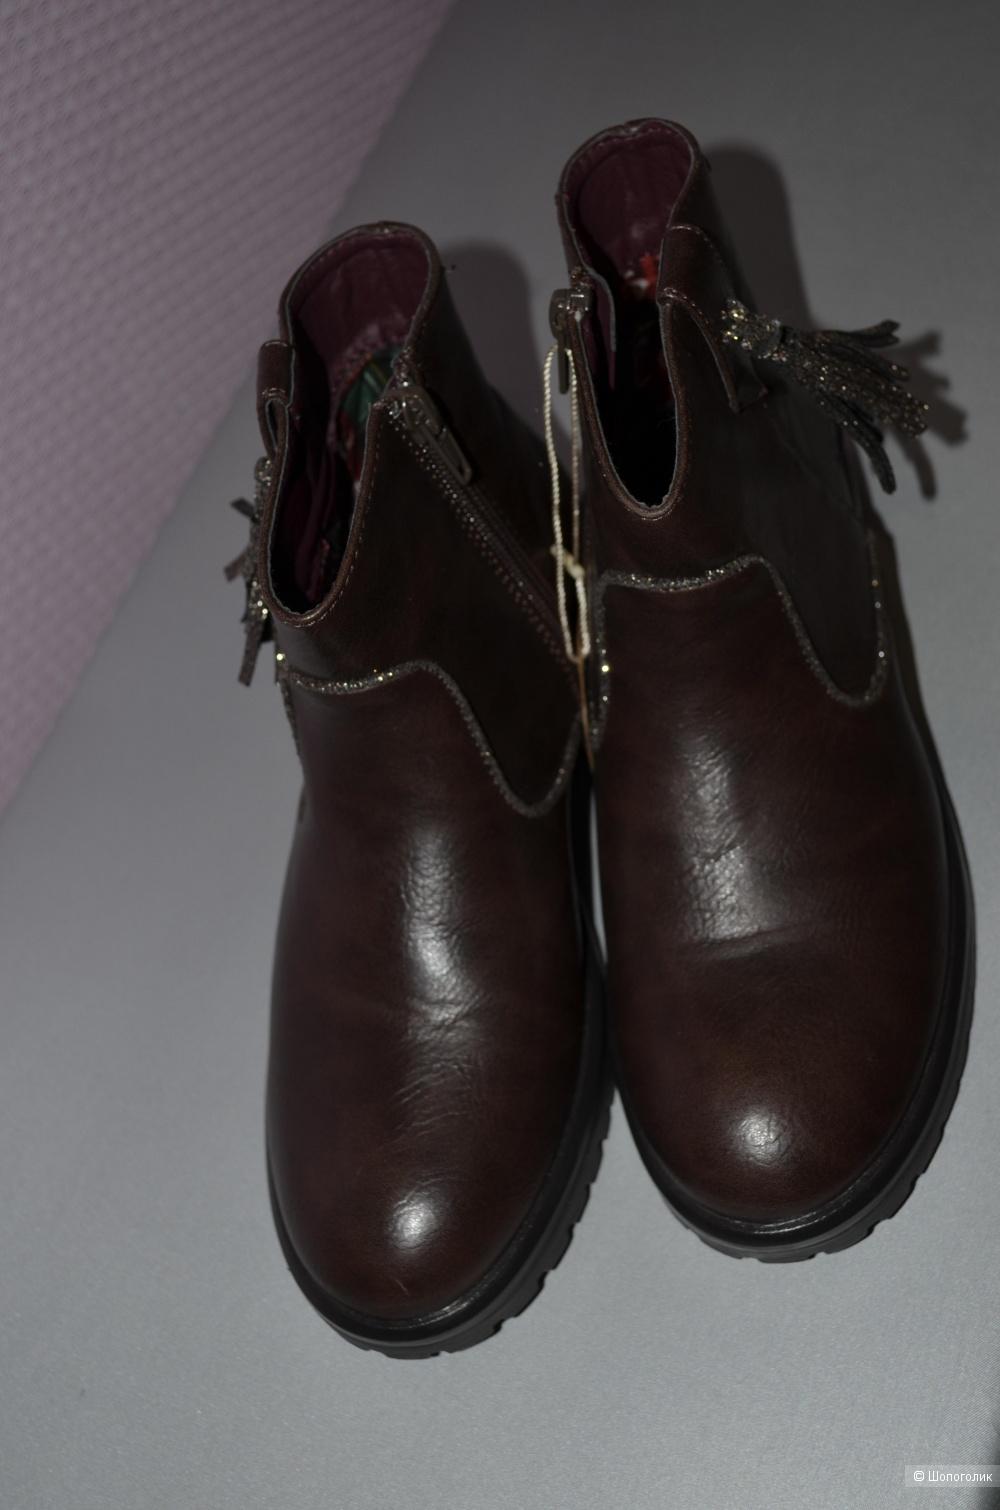 Ботиночки девичьи glosseppo 34 р-р 22см